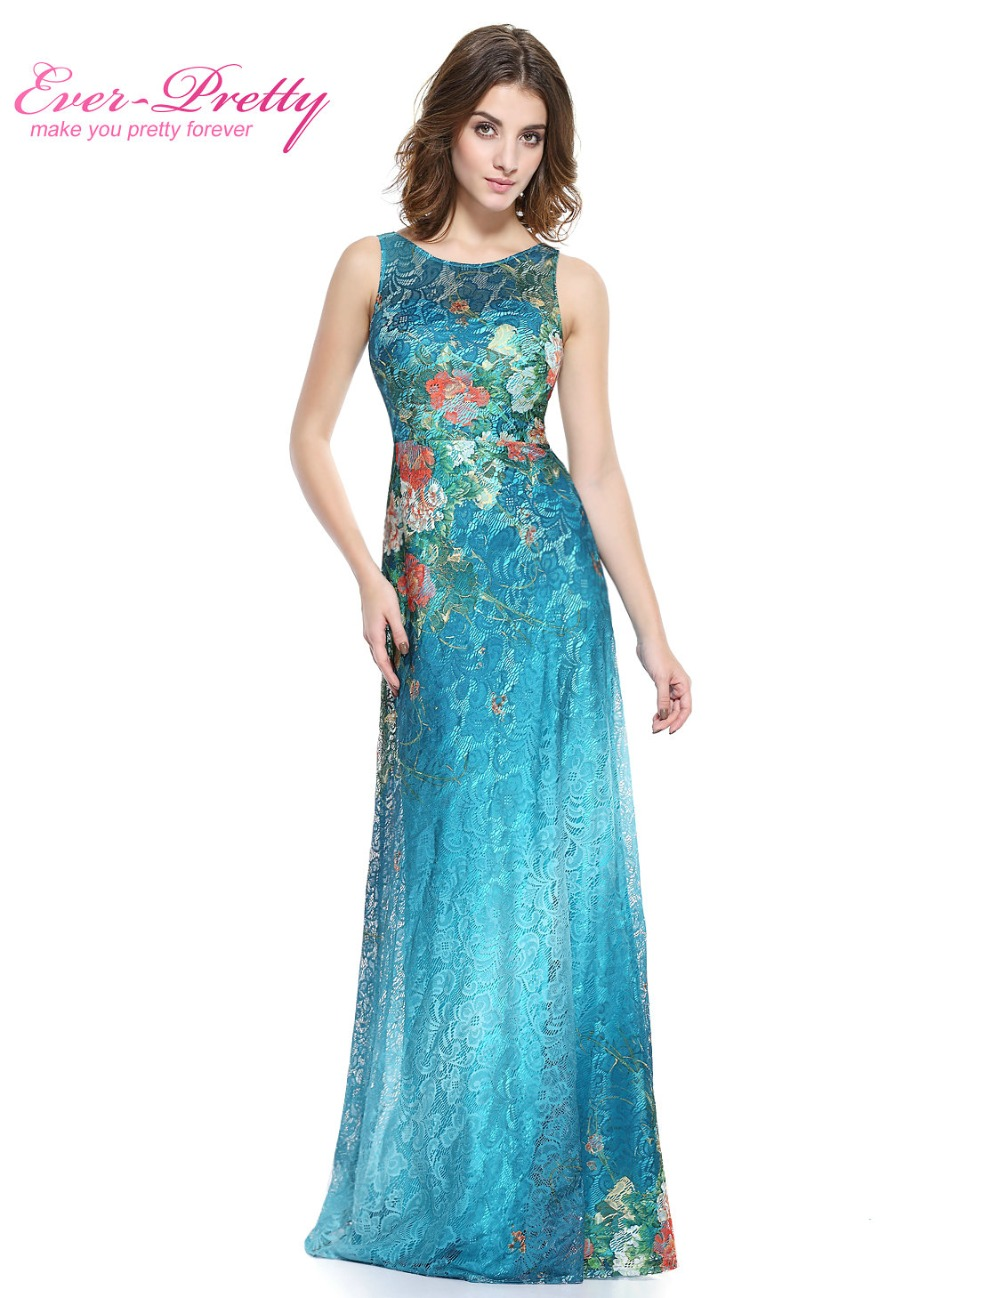 Popular Prom Dress Patterns Buy Cheap Prom Dress Patterns